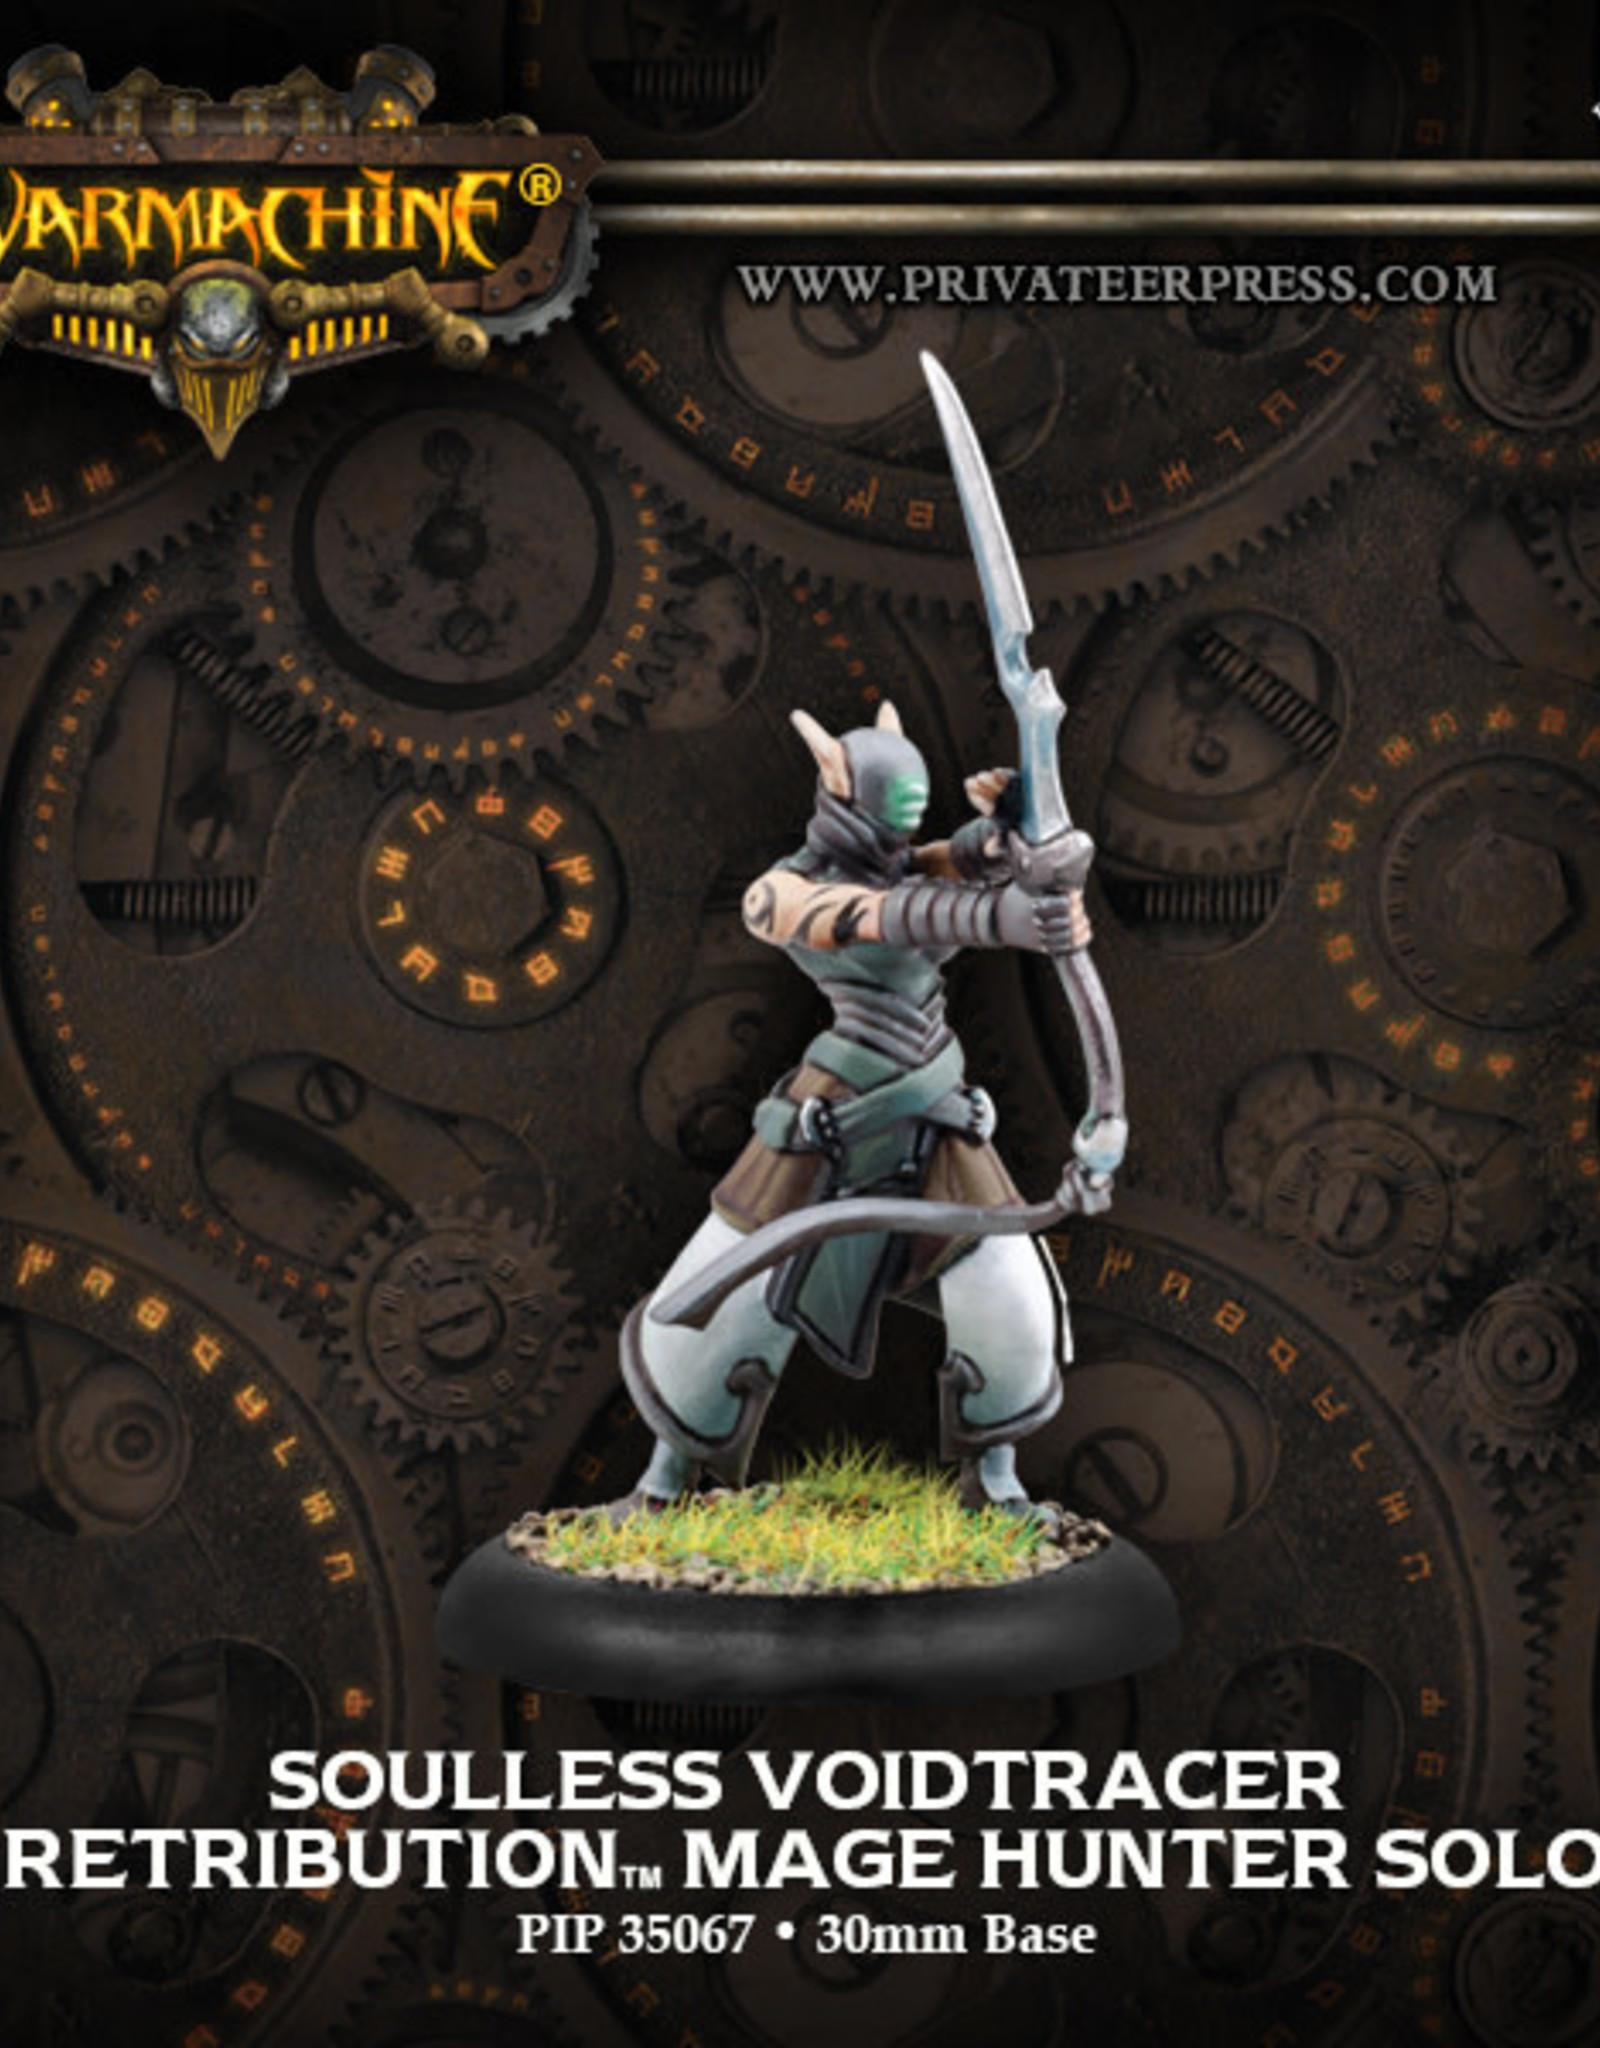 Warmachine Scyrah - Soulless Voidtracer